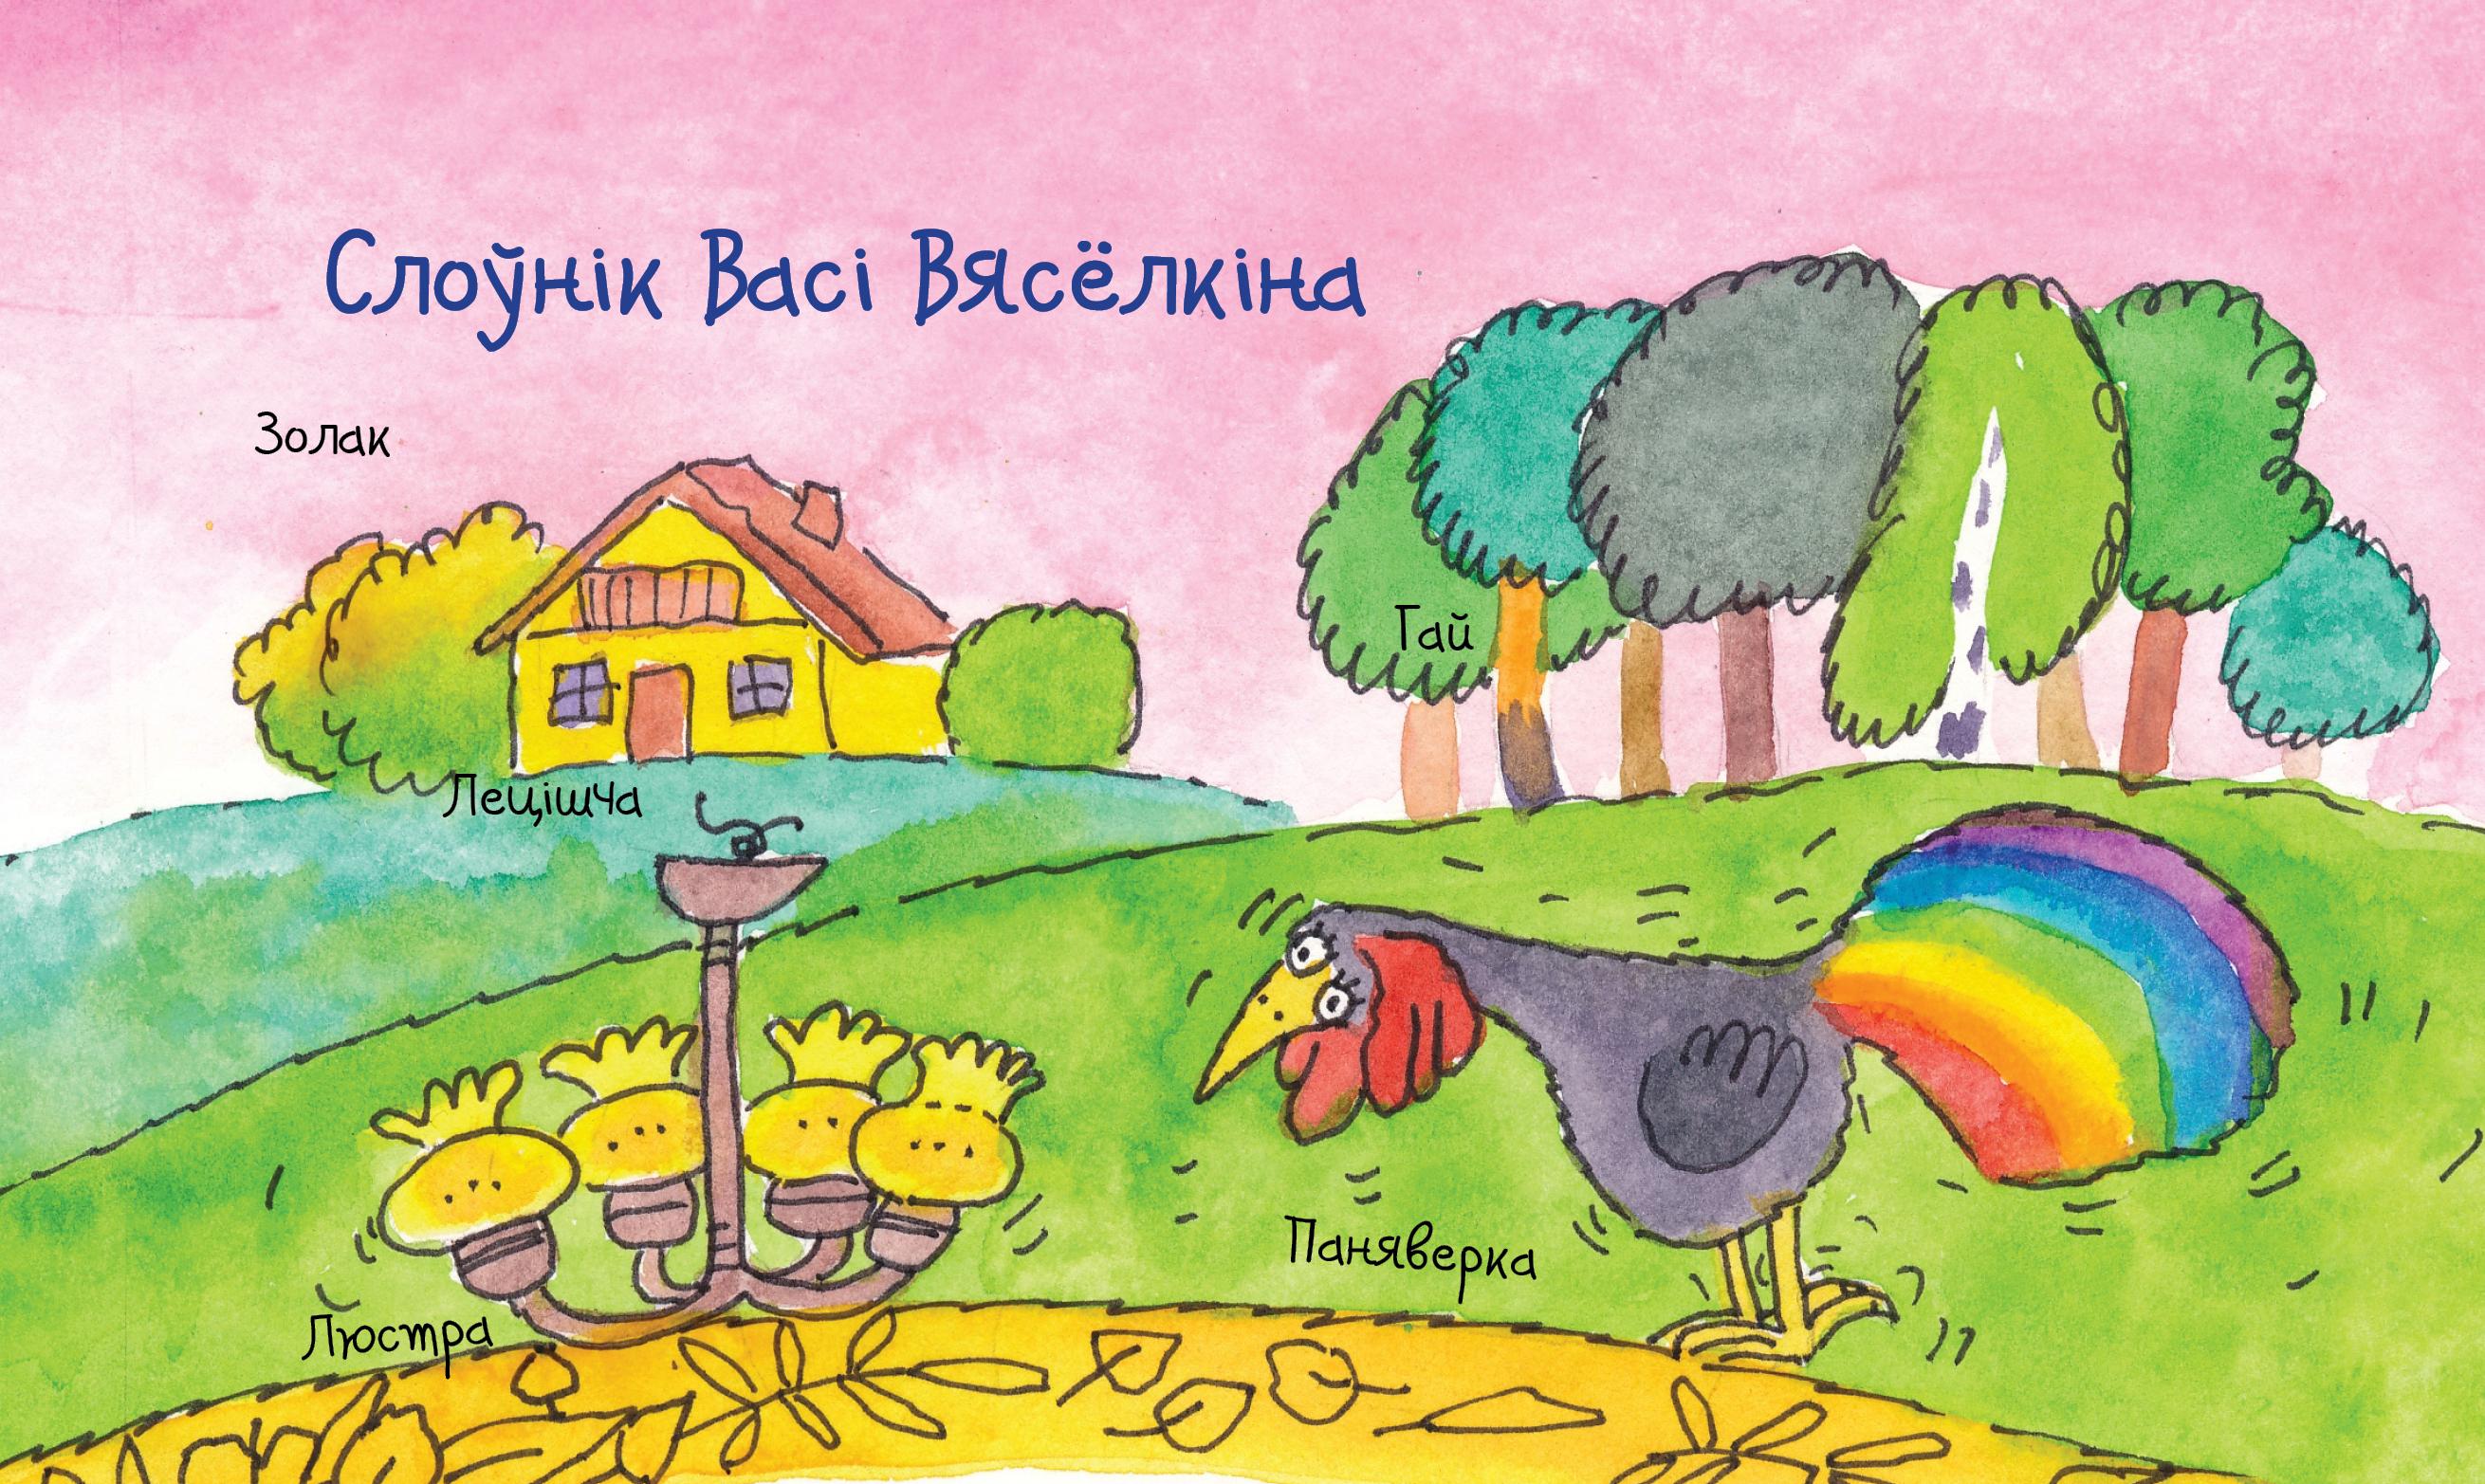 Слоўнік Васі Вясёлкіна